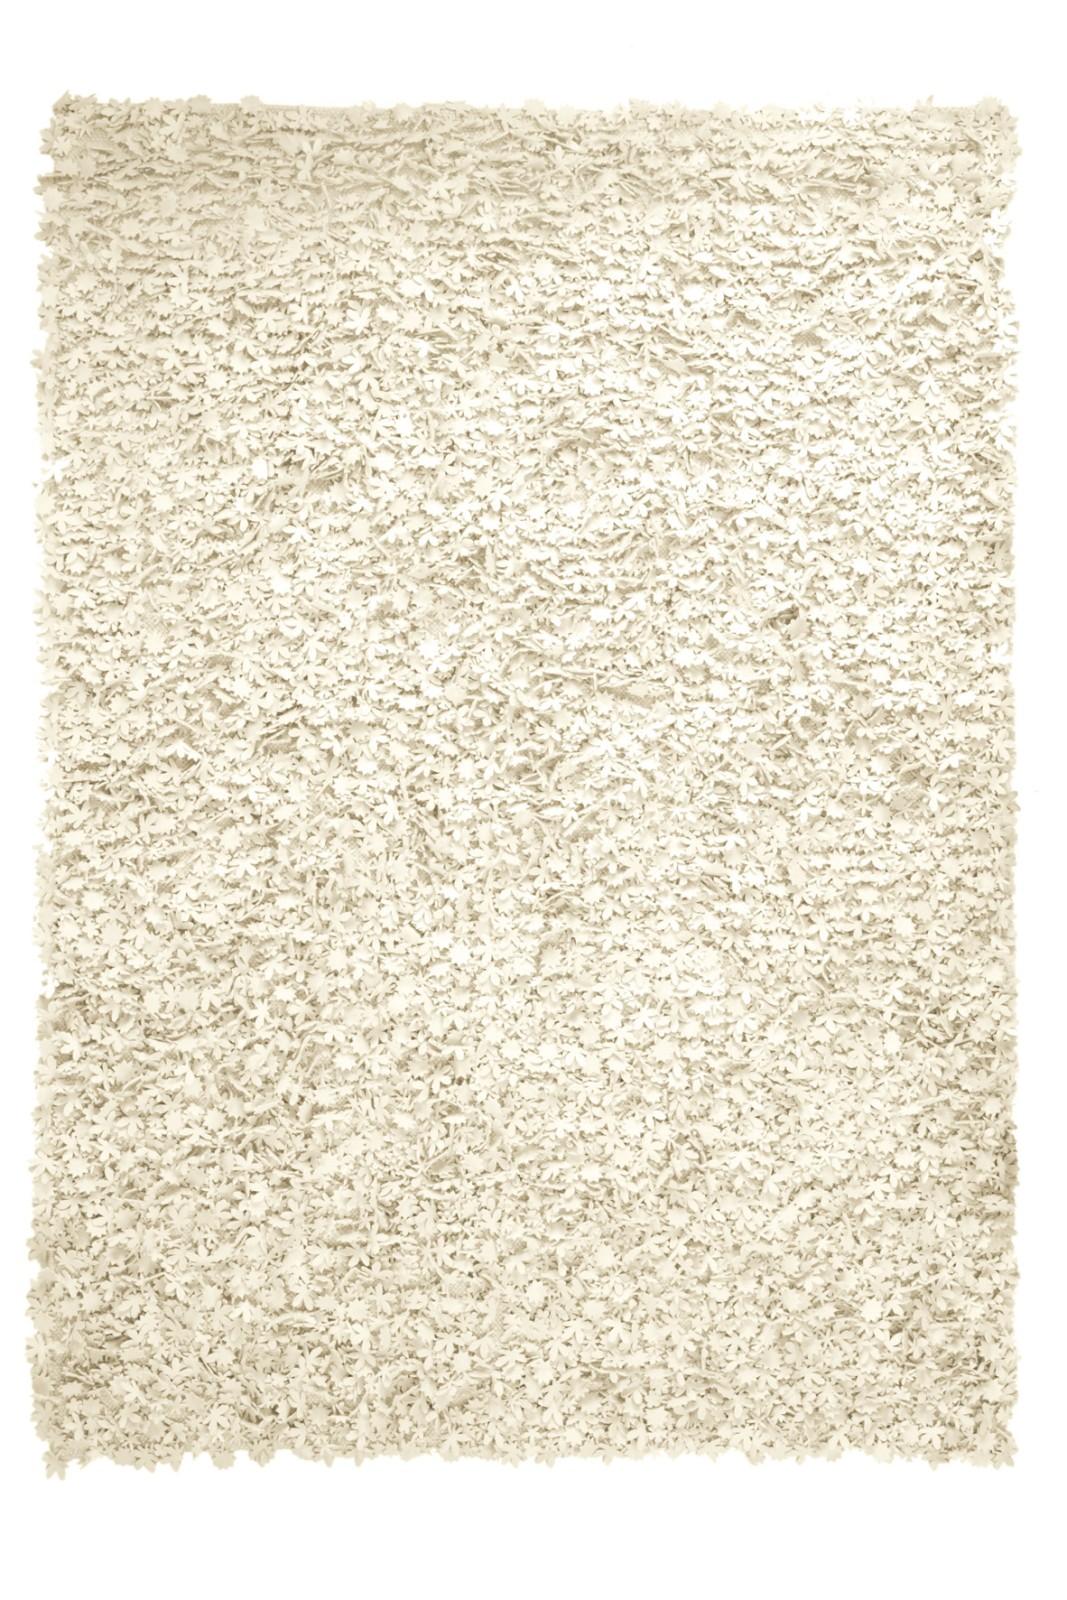 Little field of flowers Rug Ivory, 300 x 400 cm